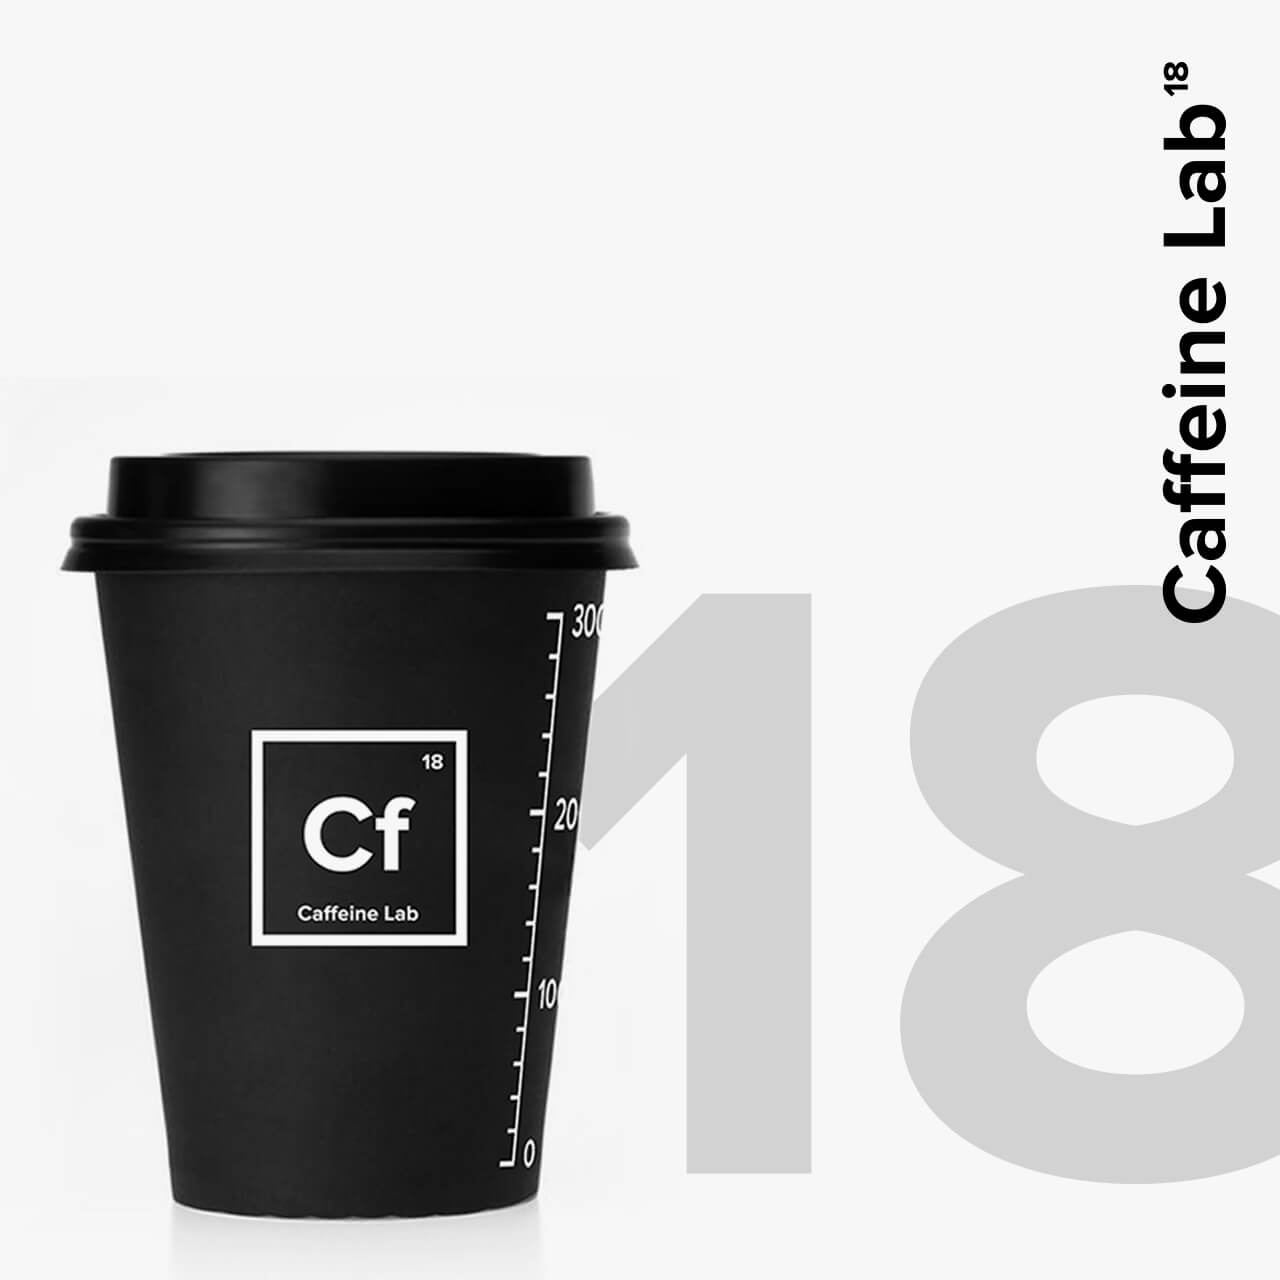 Caffeine Lab